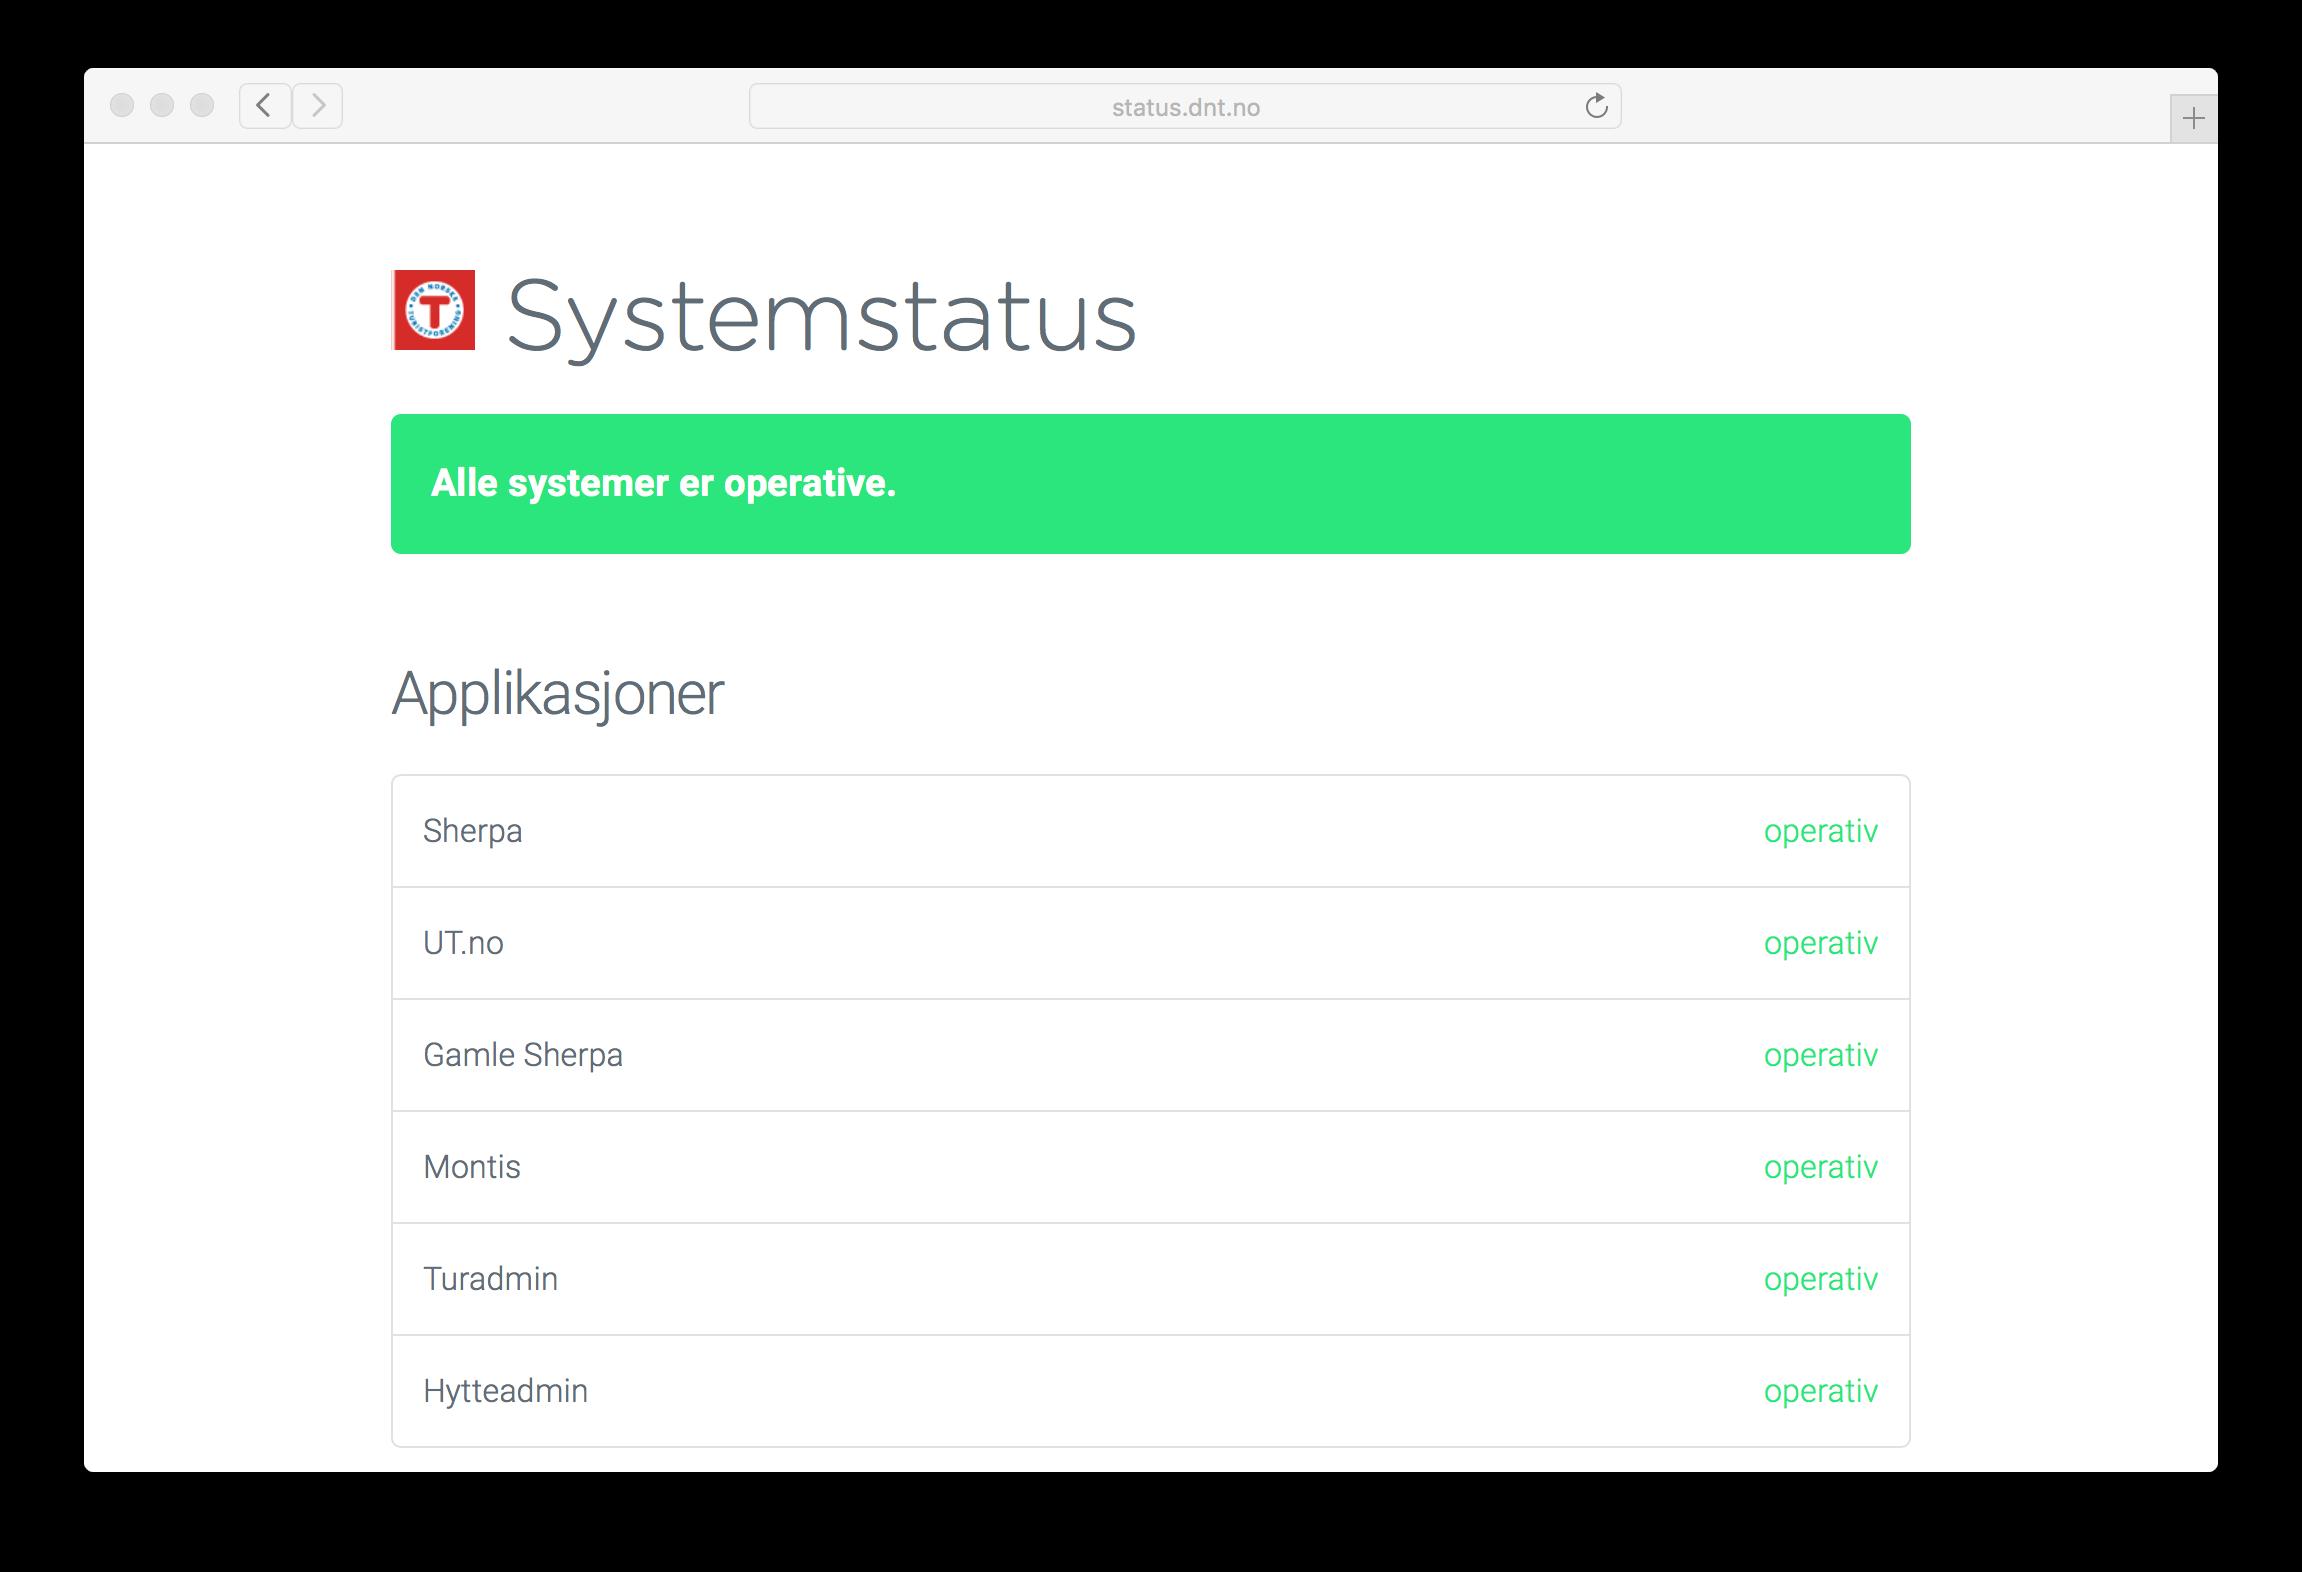 GitHub - Turistforeningen/status: System Status Overview Turistforeningen/status - 웹